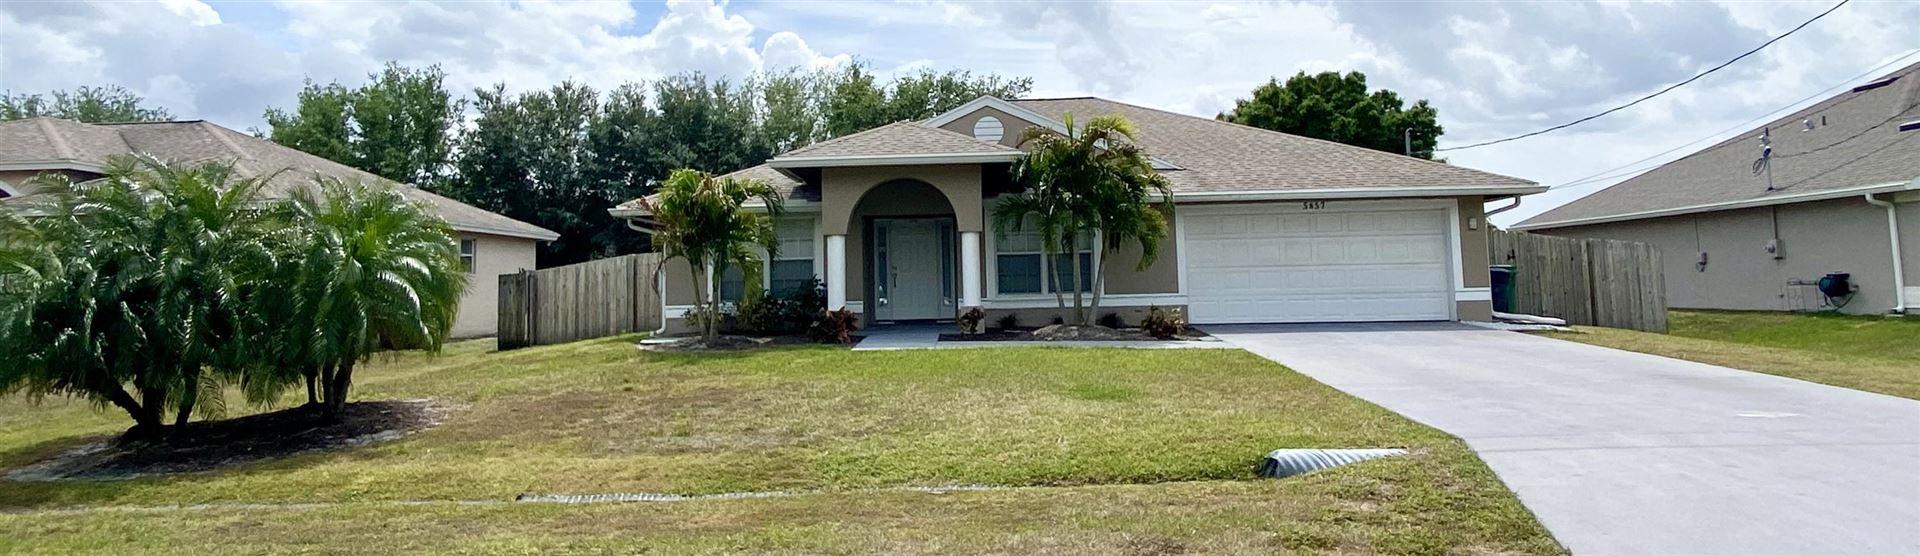 5857 NW Cullom Circle, Port Saint Lucie, FL 34986 - #: RX-10704295